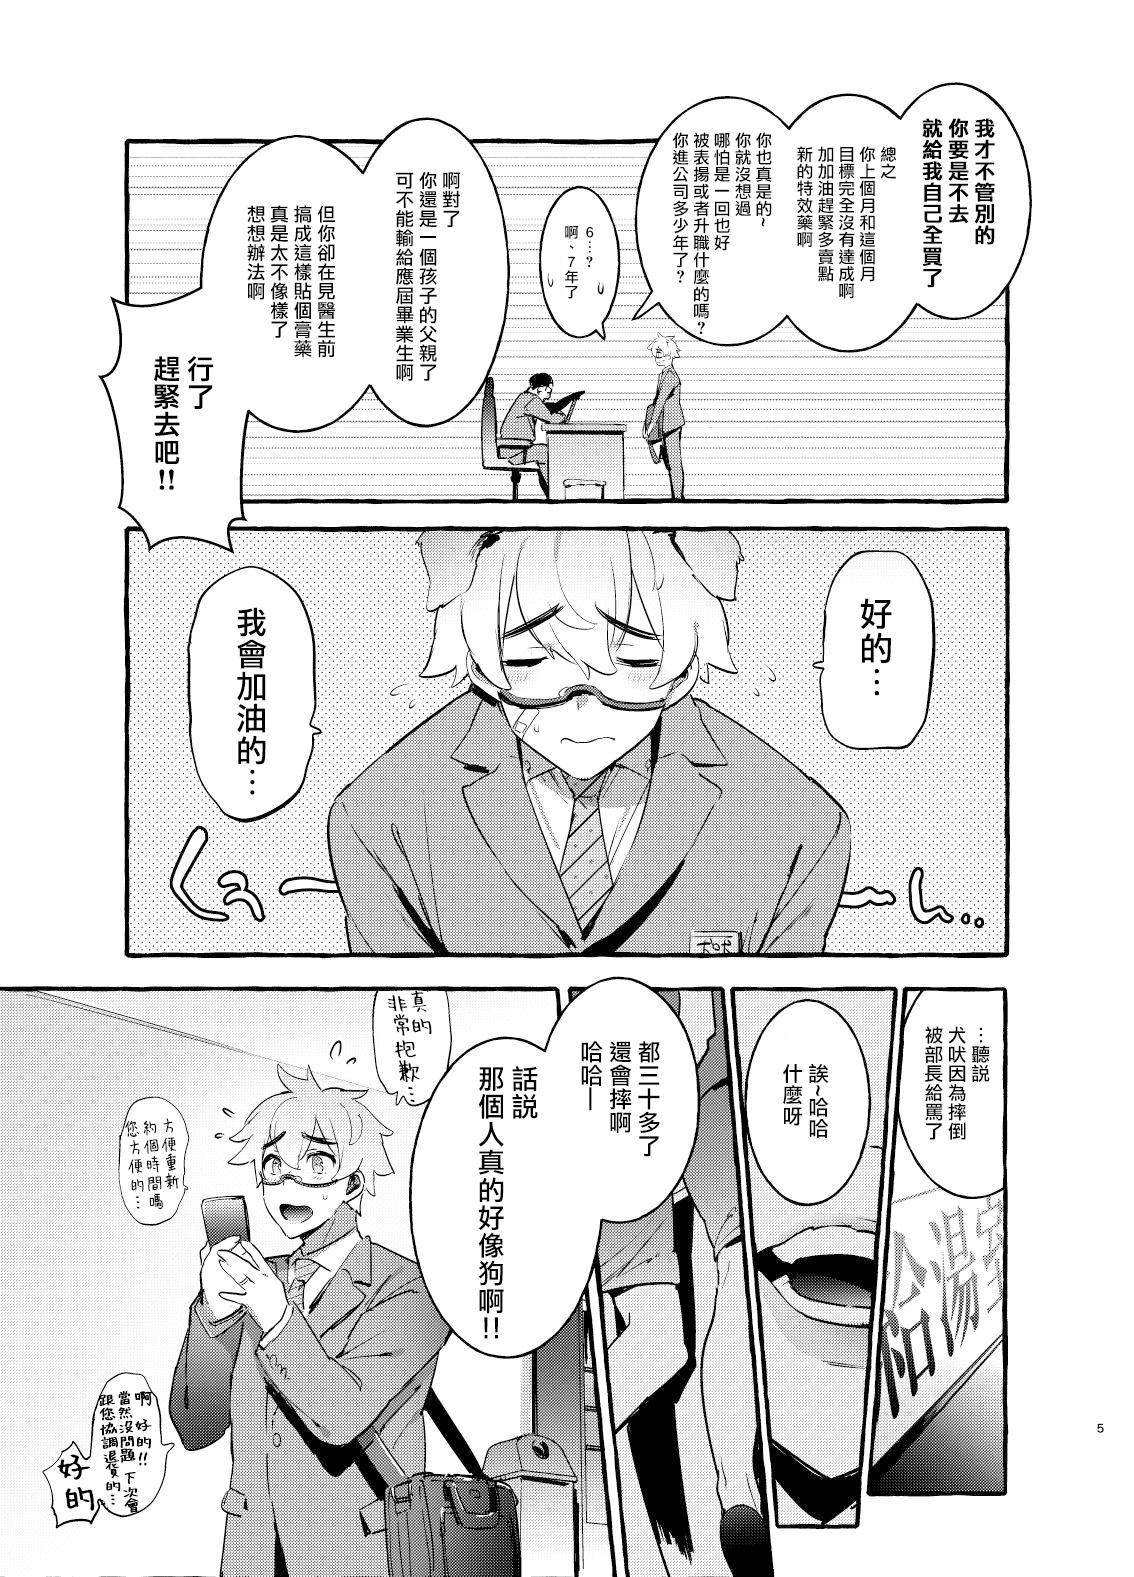 [Otosan no Kurorekishi (Maemukina Do M)]  Wanwan Otou-san   犬系爸爸 01-02 [Chinese] [拾荒者汉化组] [Digital] 5